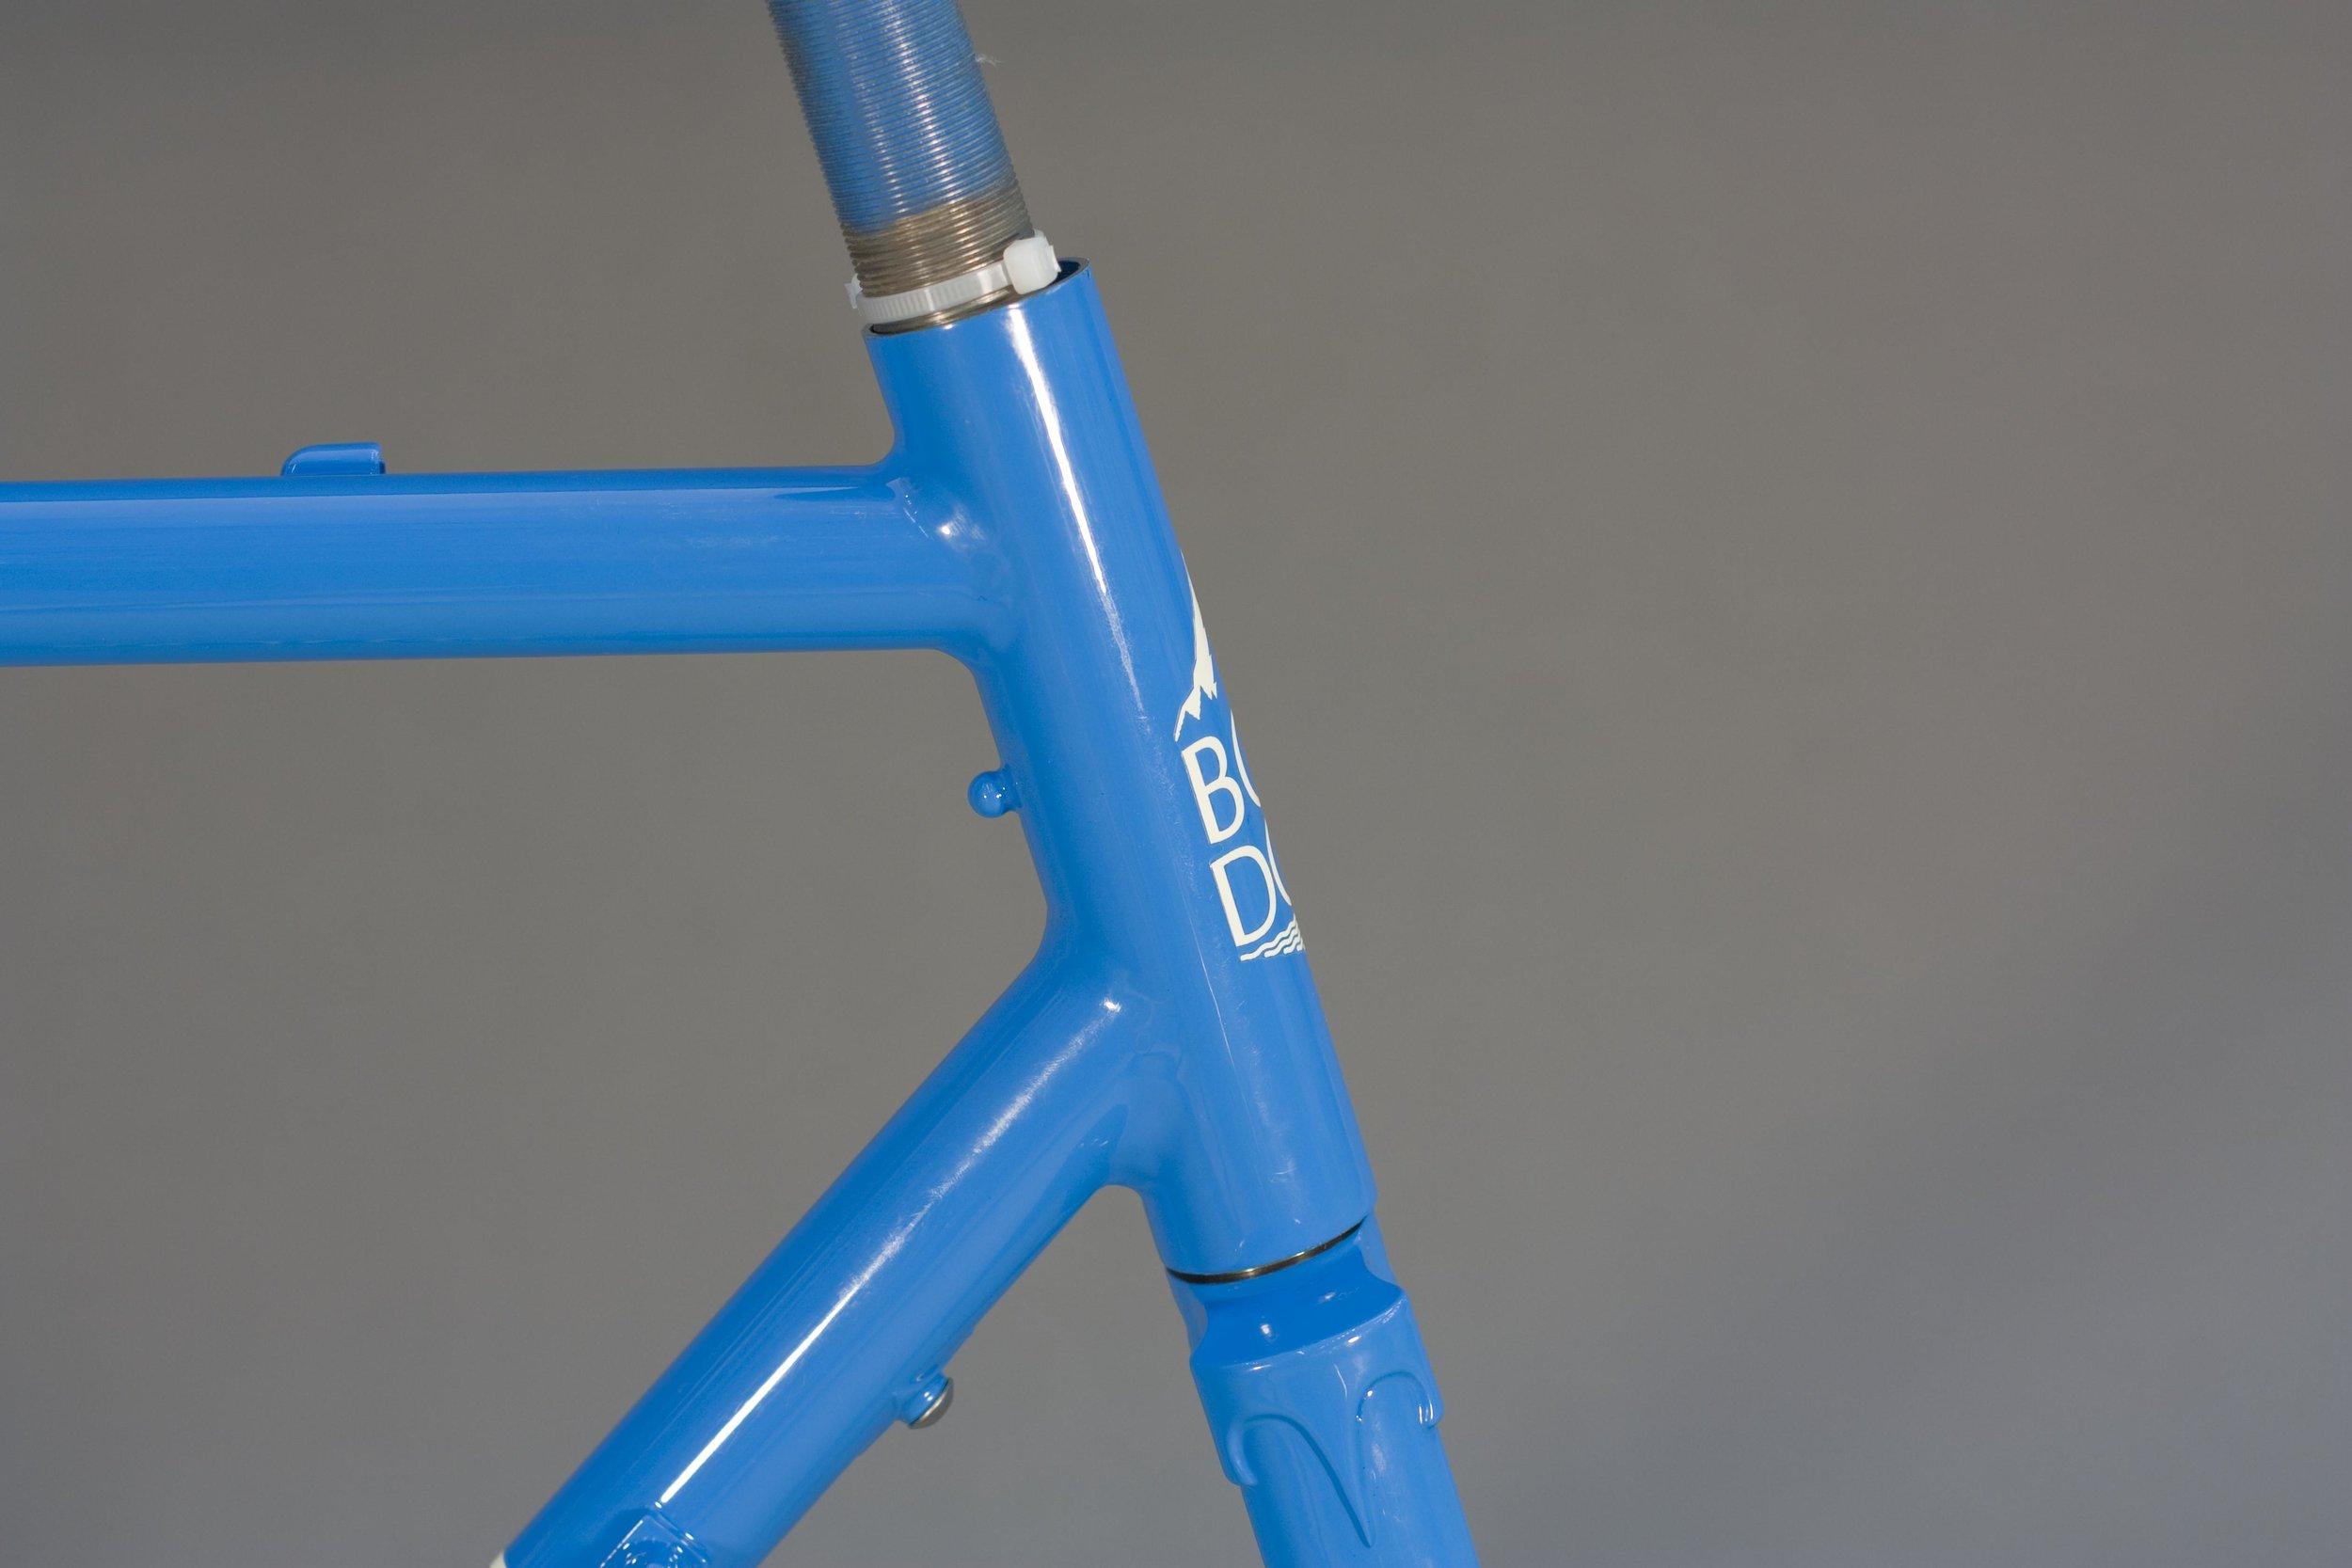 56cm-winter-bicycles-built-pelican_8269872059_o.jpg